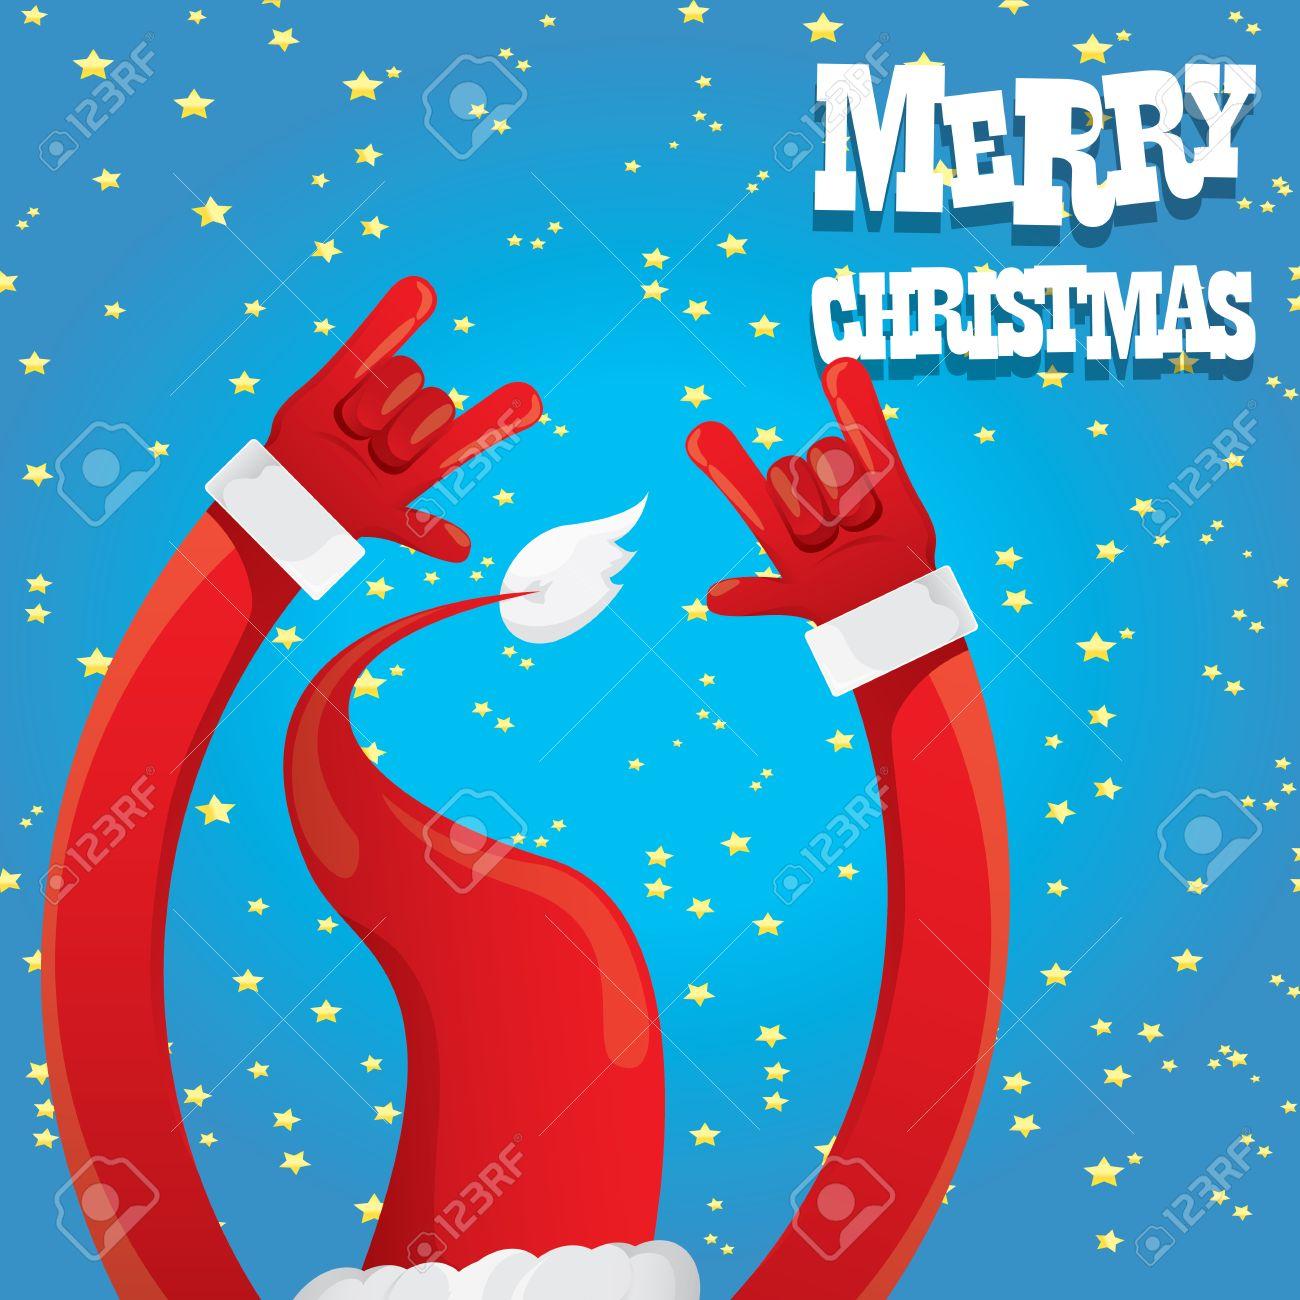 Rock n roll poster design - Santa Claus Hand Rock N Roll Icon Illustration Christmas Rock N Roll Concert Poster Design